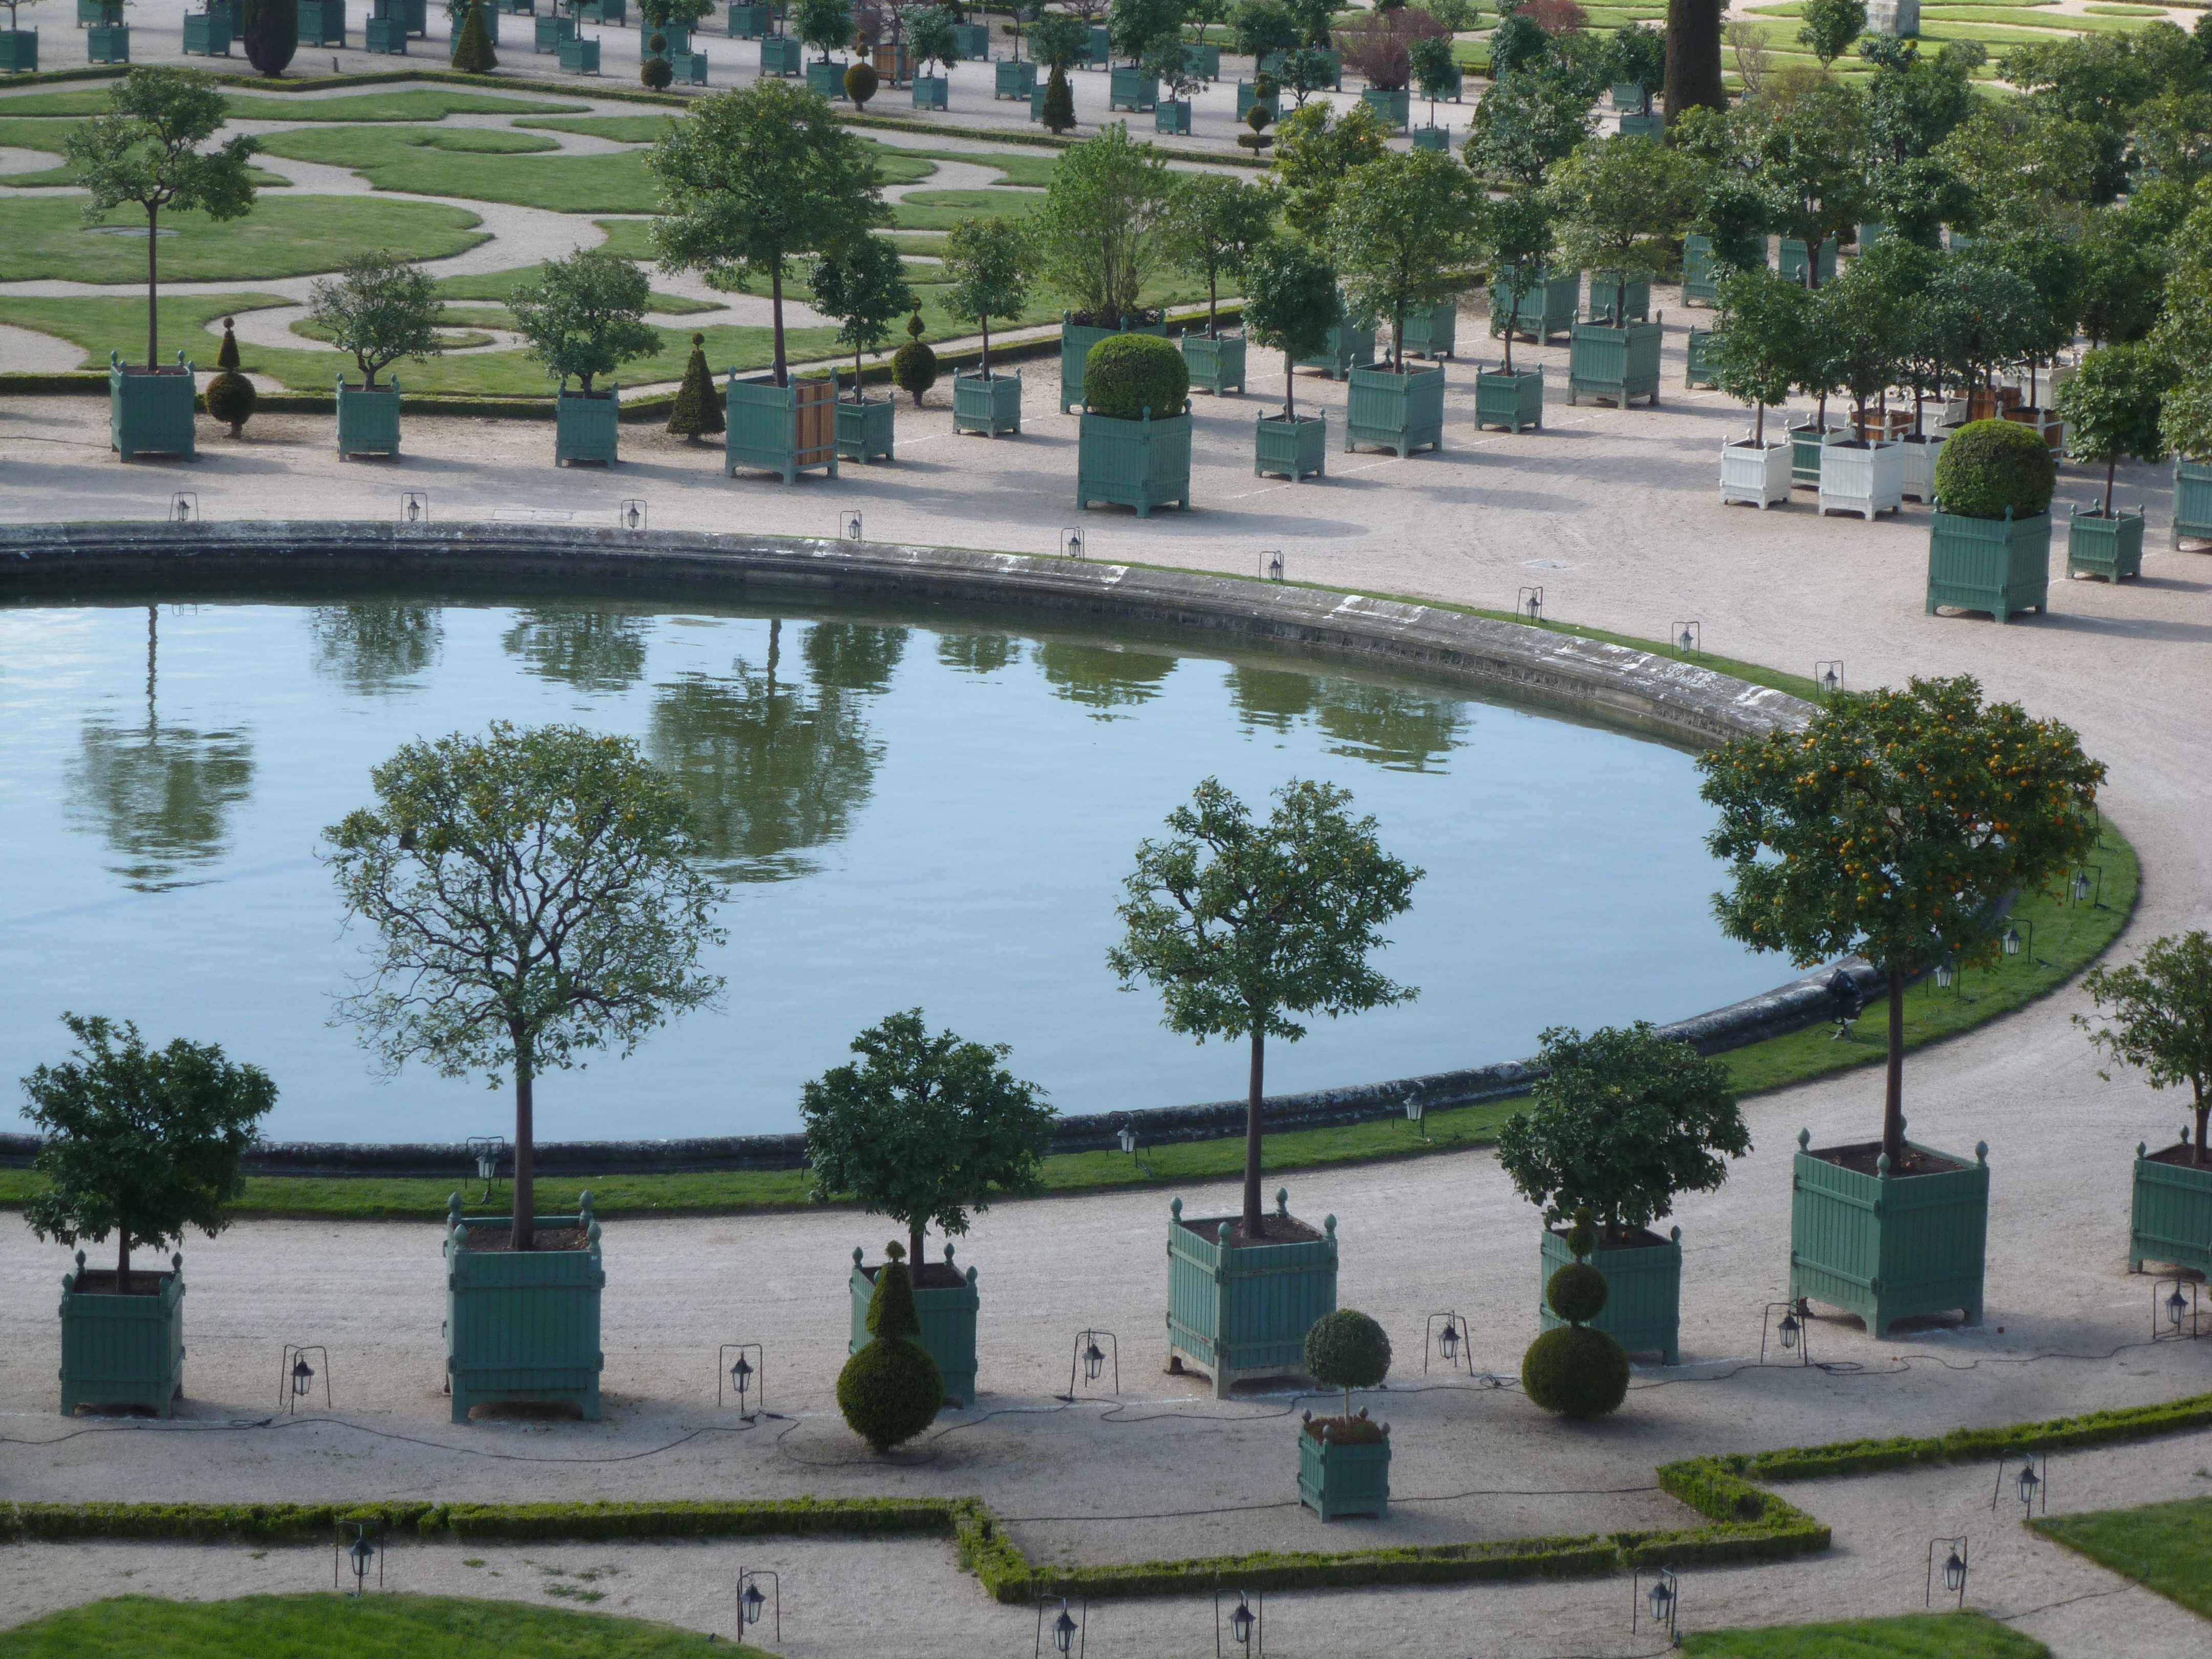 Versailles orangerie bassin et reflets 05-2013